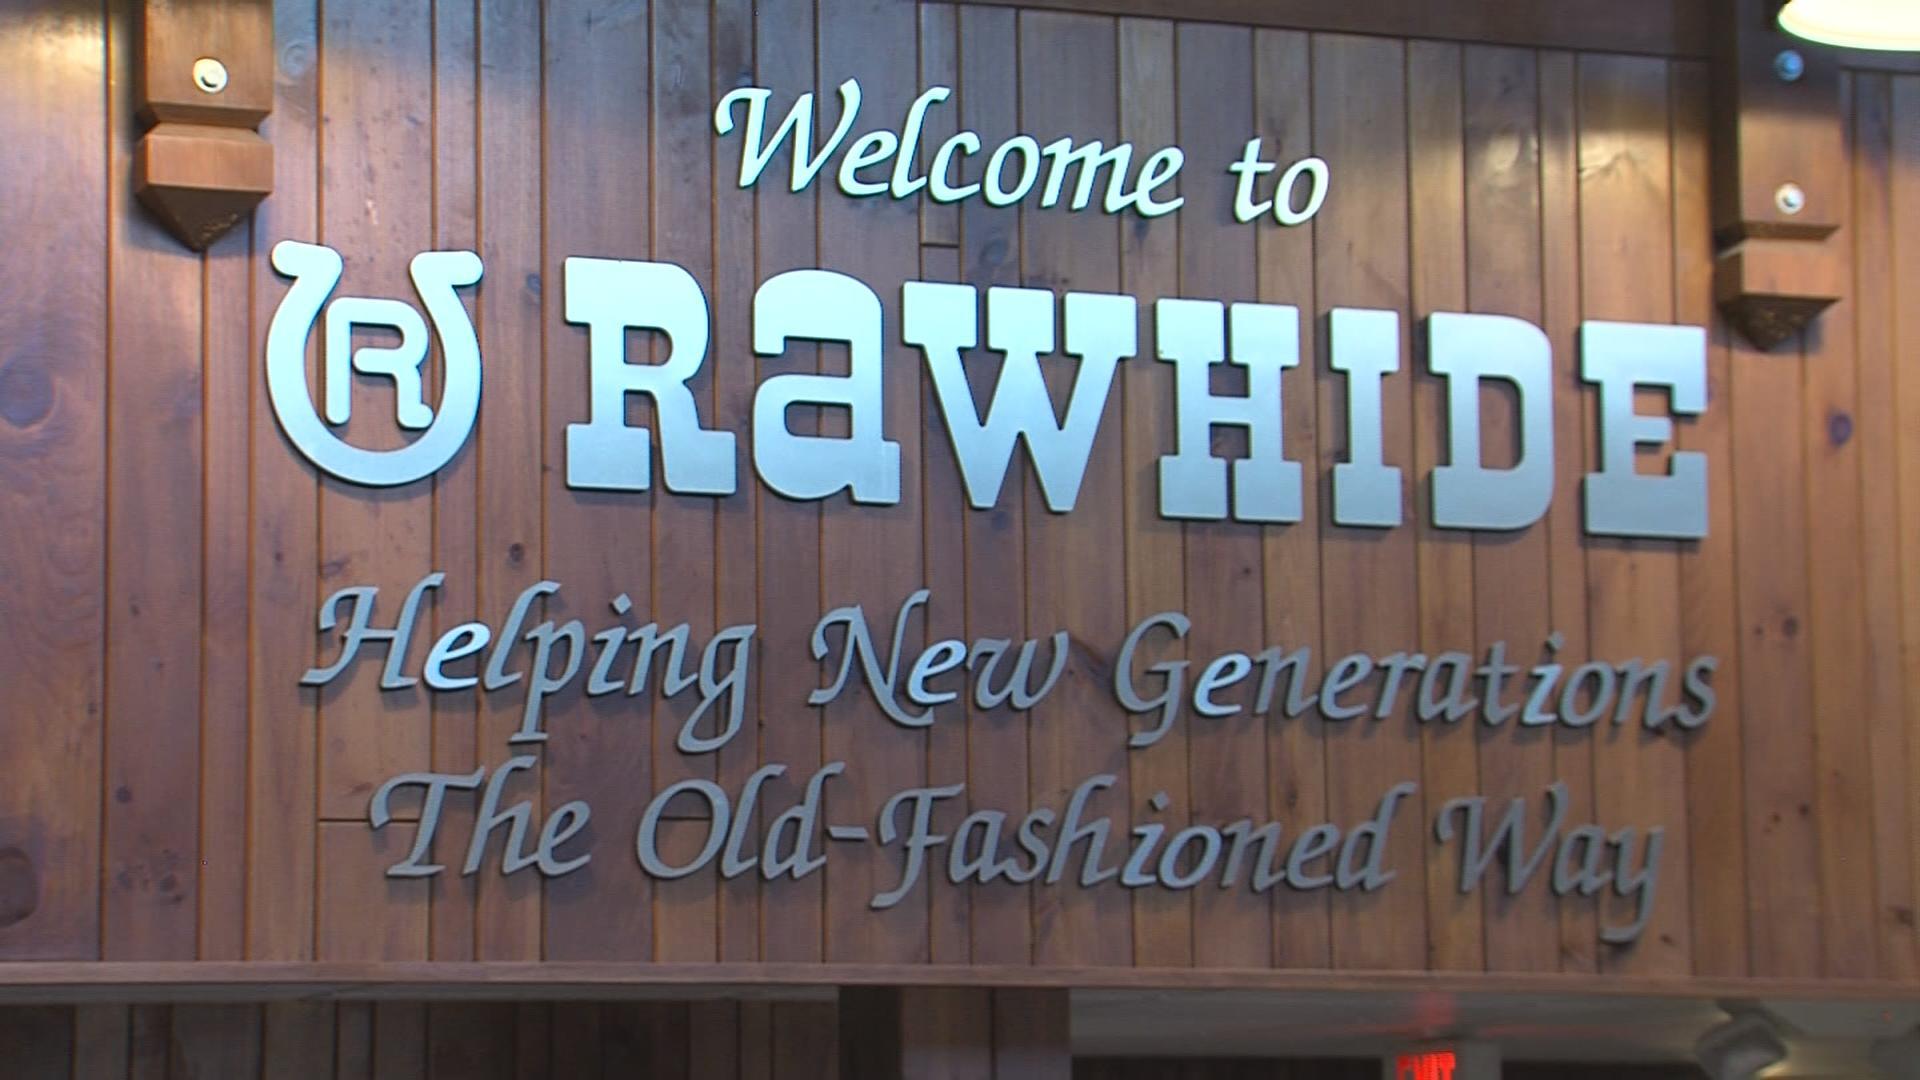 6-P-RAWHIDE BOYS RANCH_1442714169919.jpg